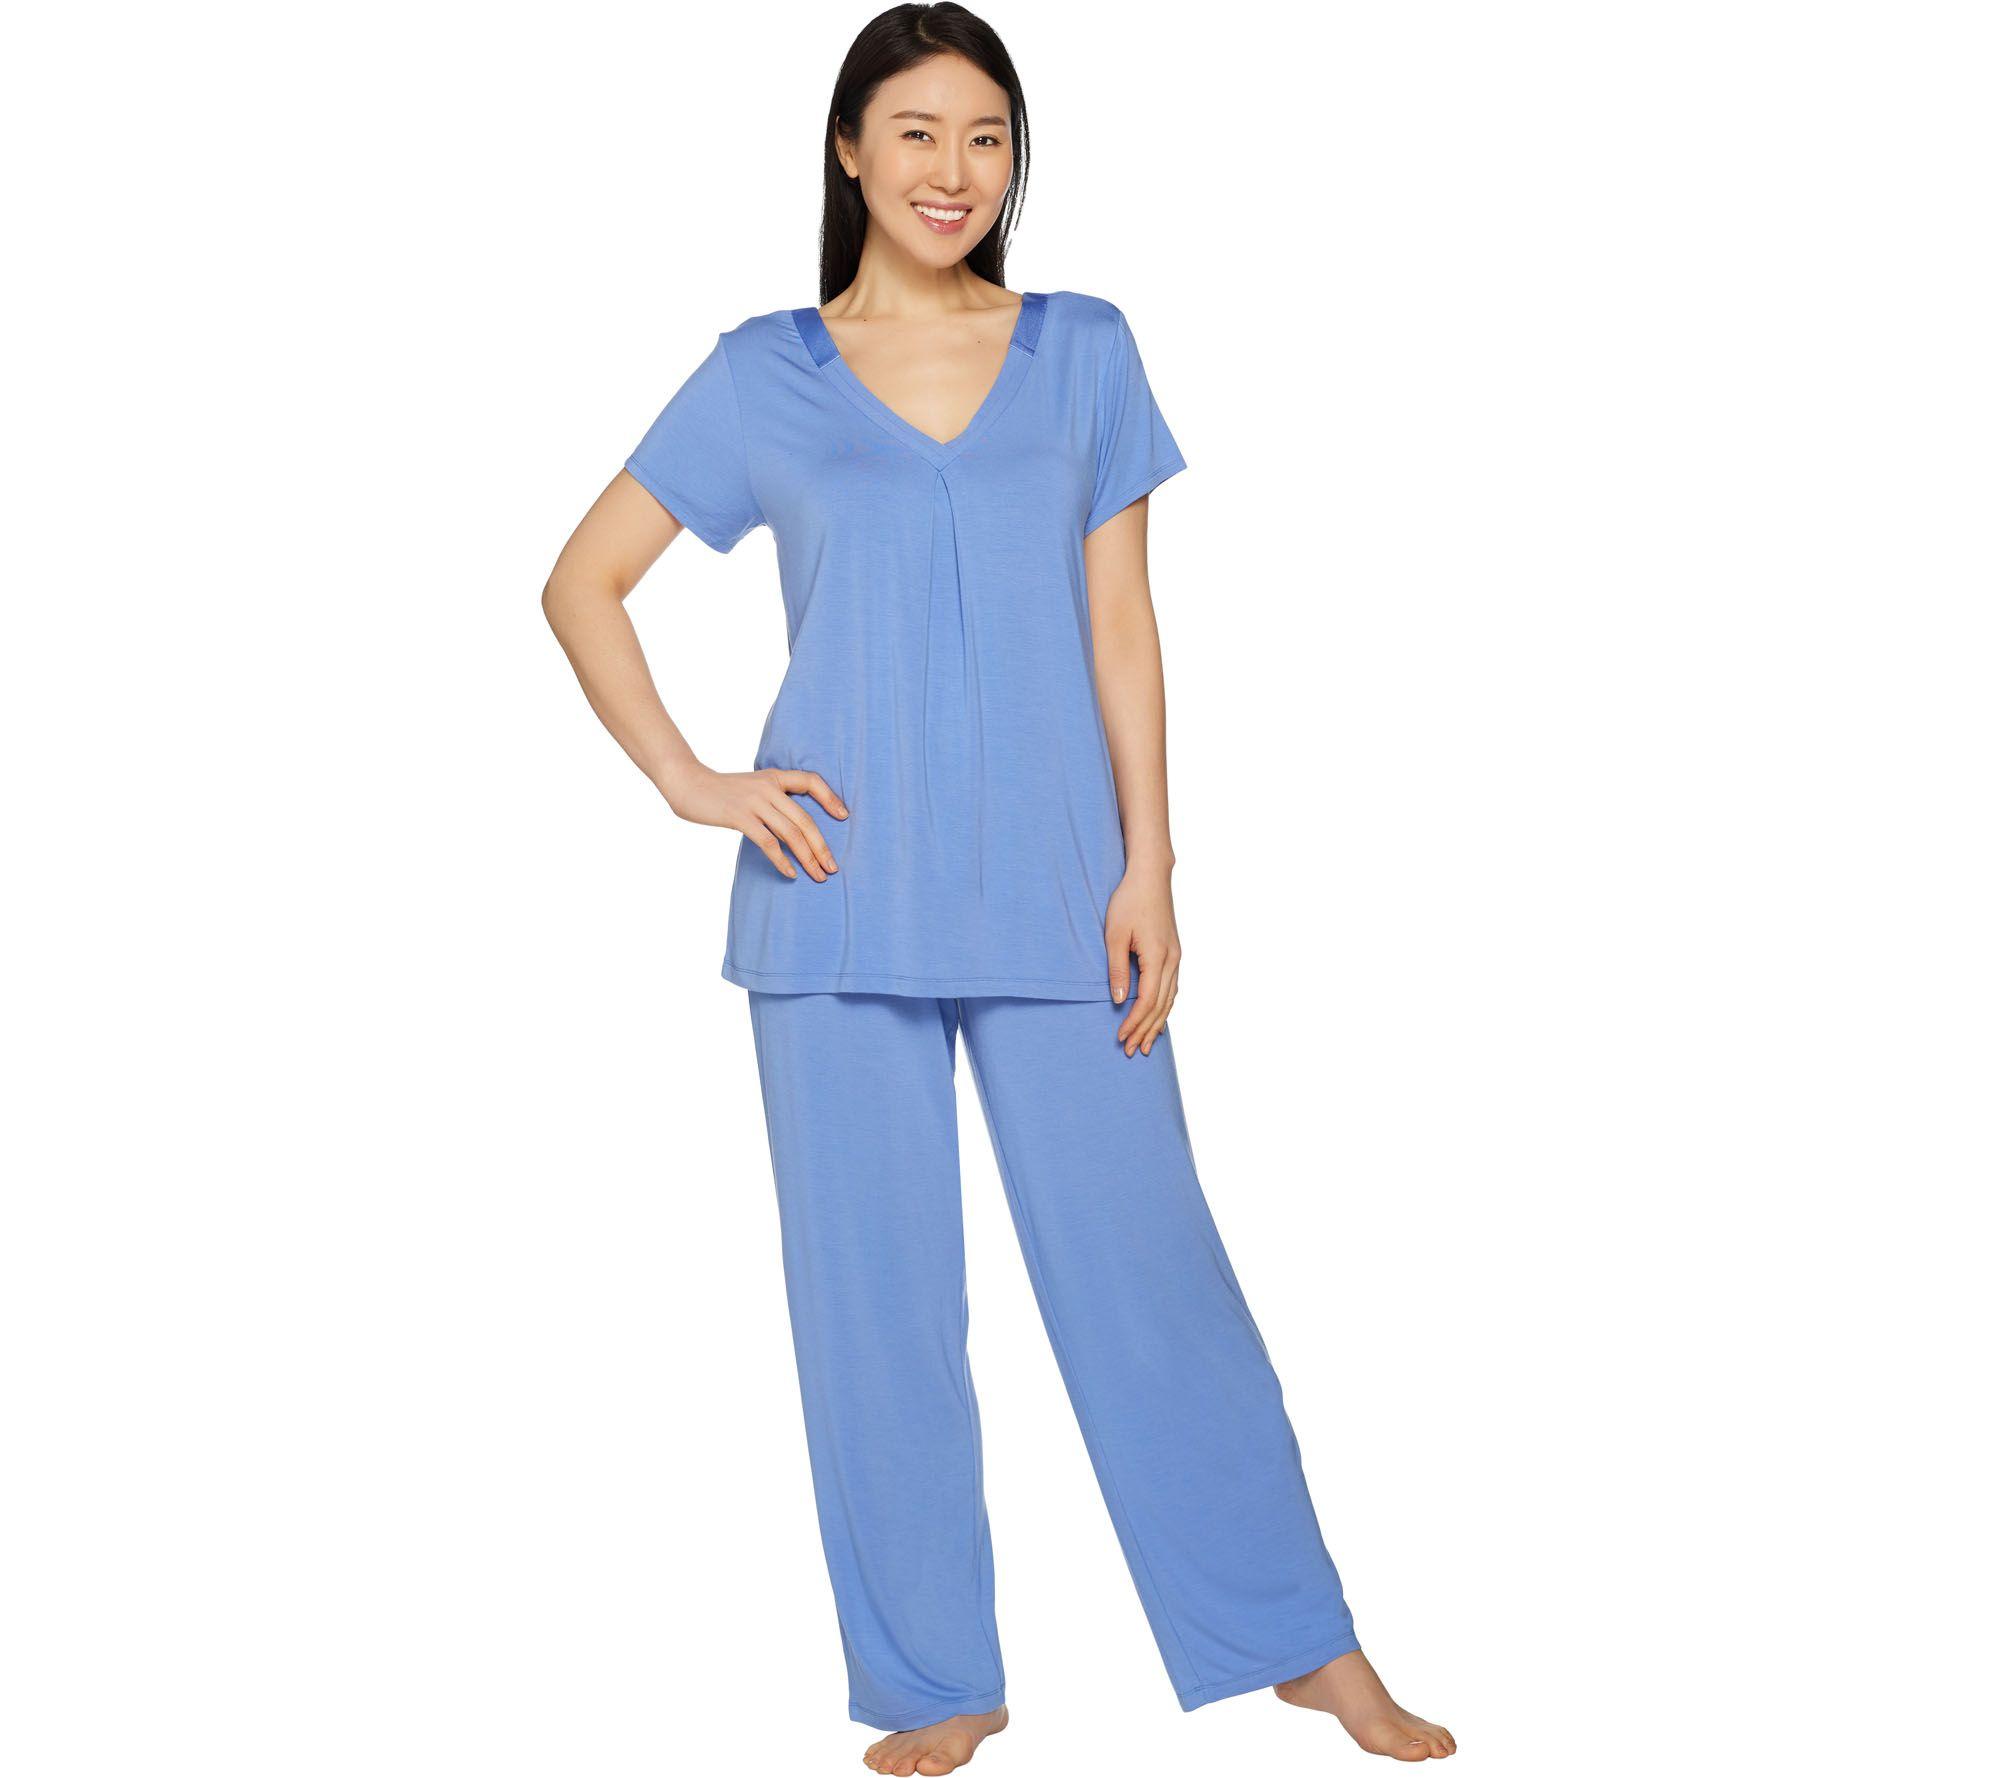 f6014a5d6b Carole Hochman Modal Spandex Satin Pajama Set - Page 1 — QVC.com